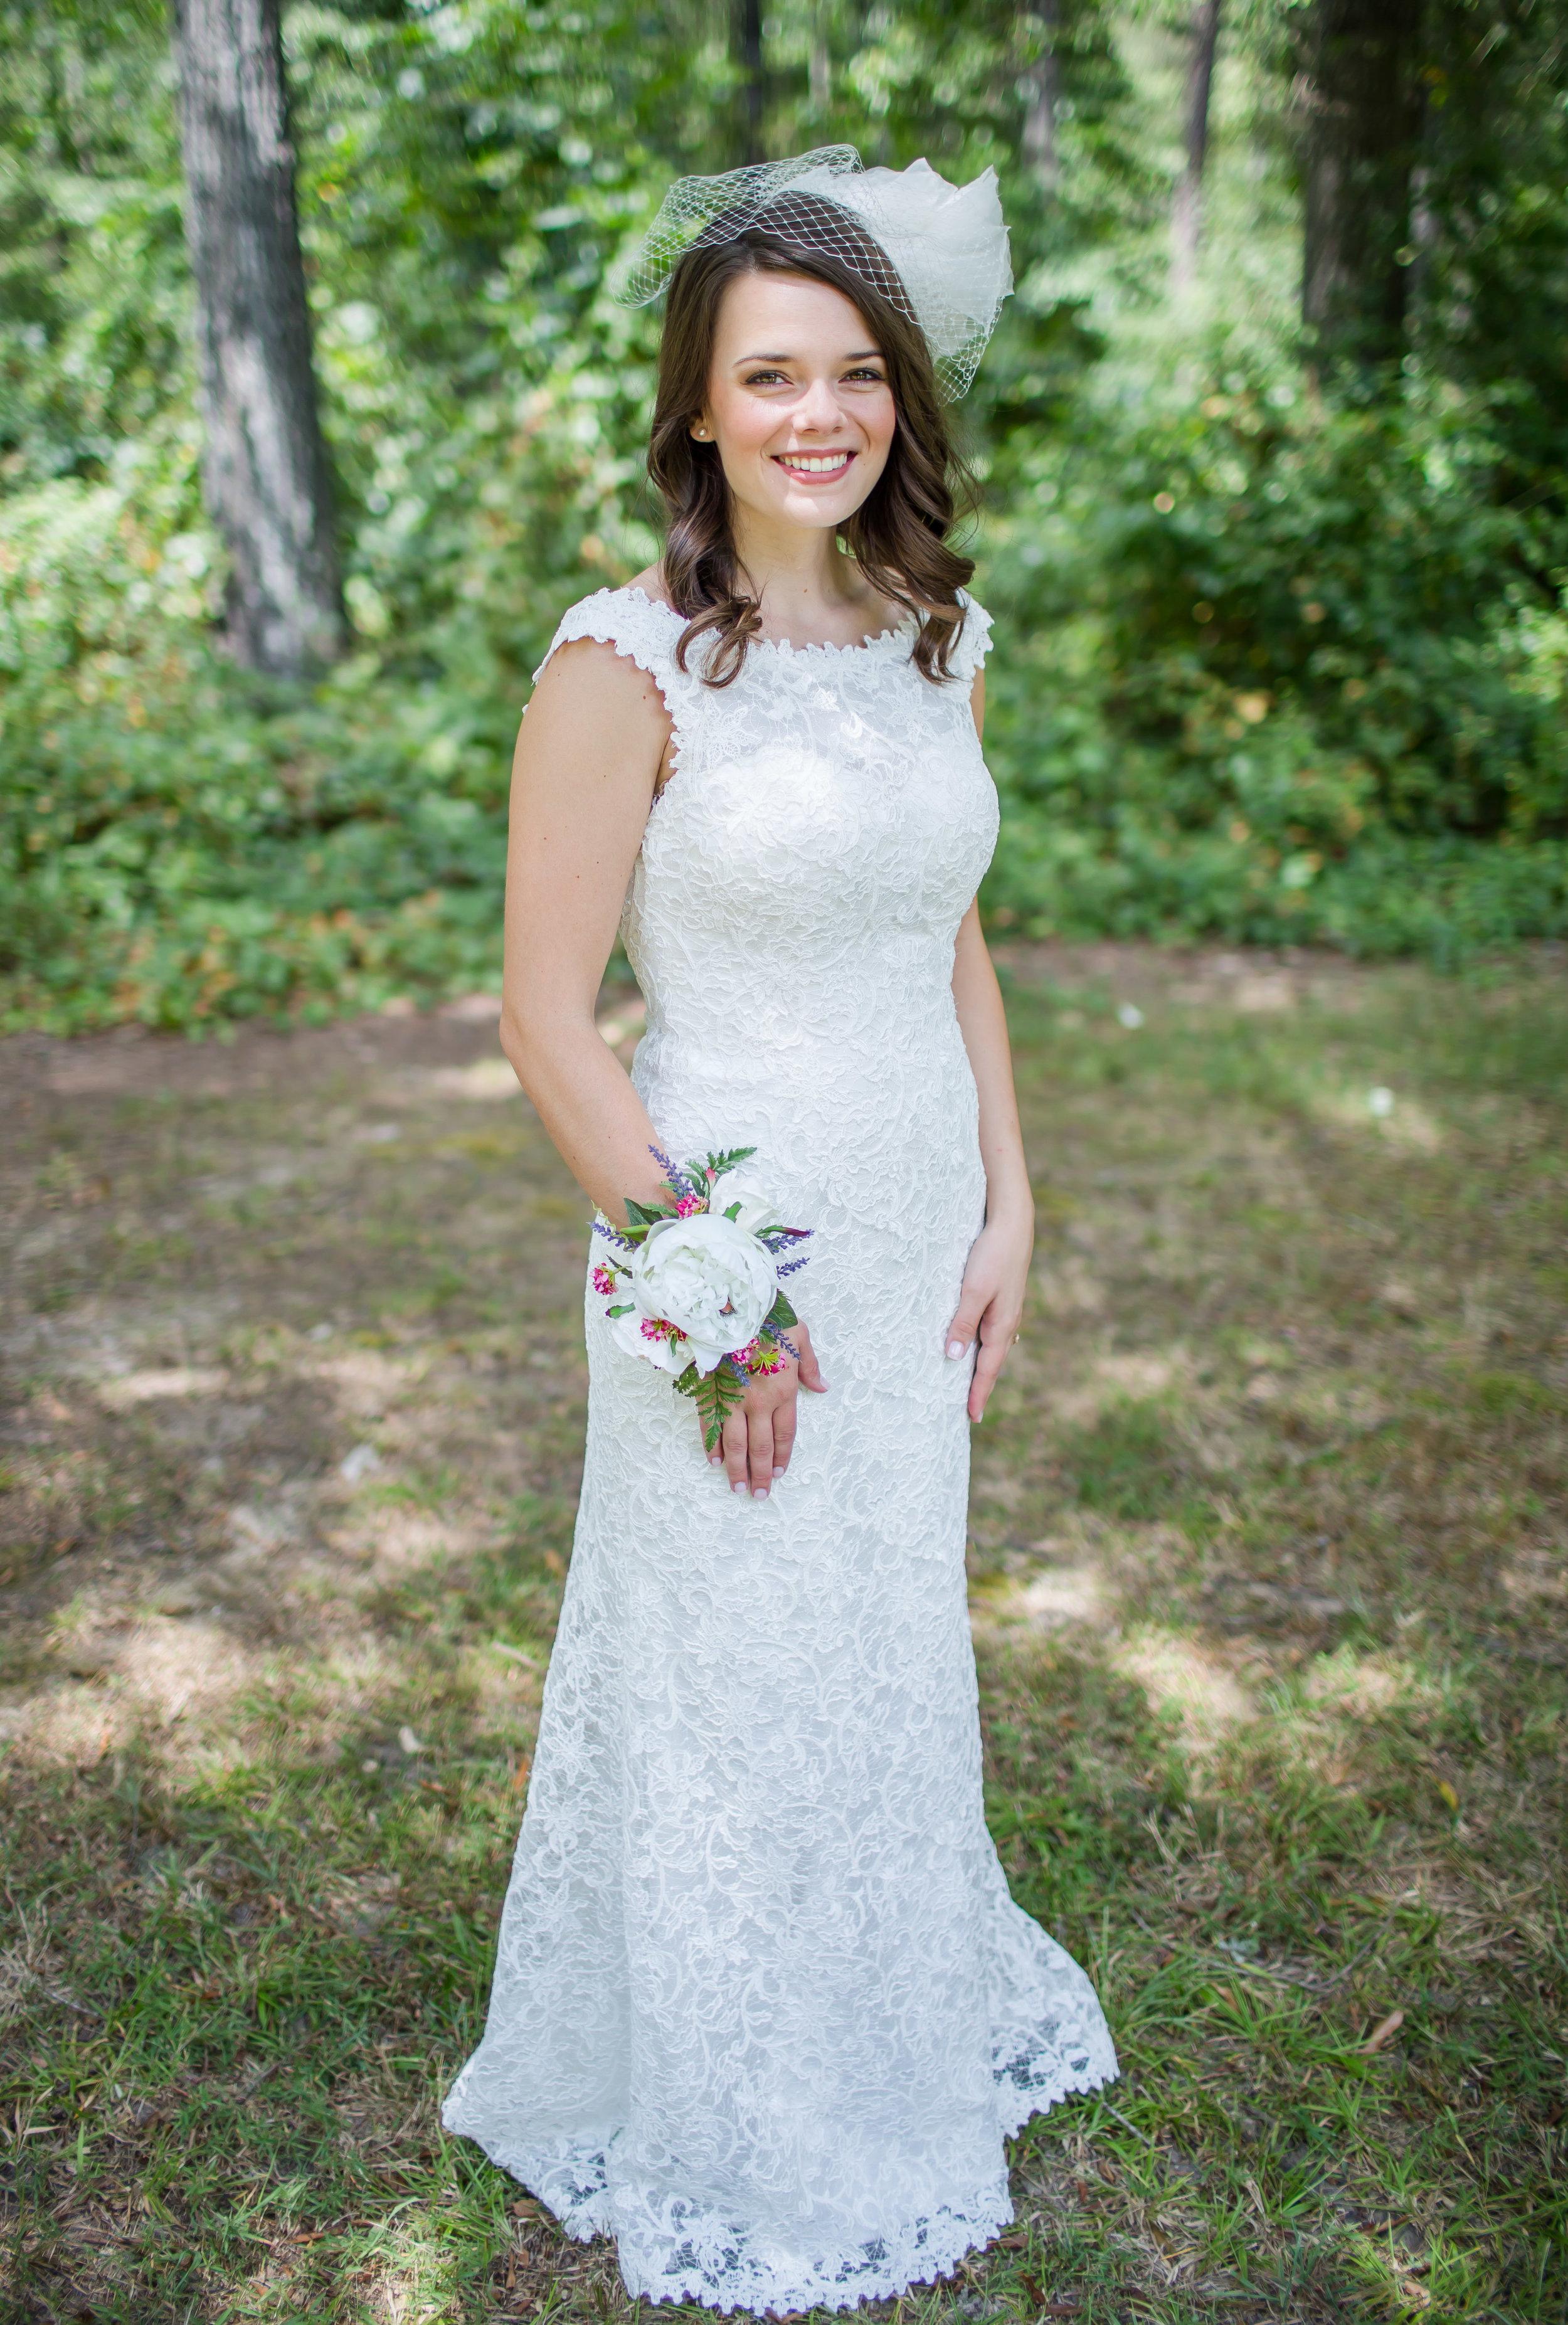 wedding (1 of 5).jpg